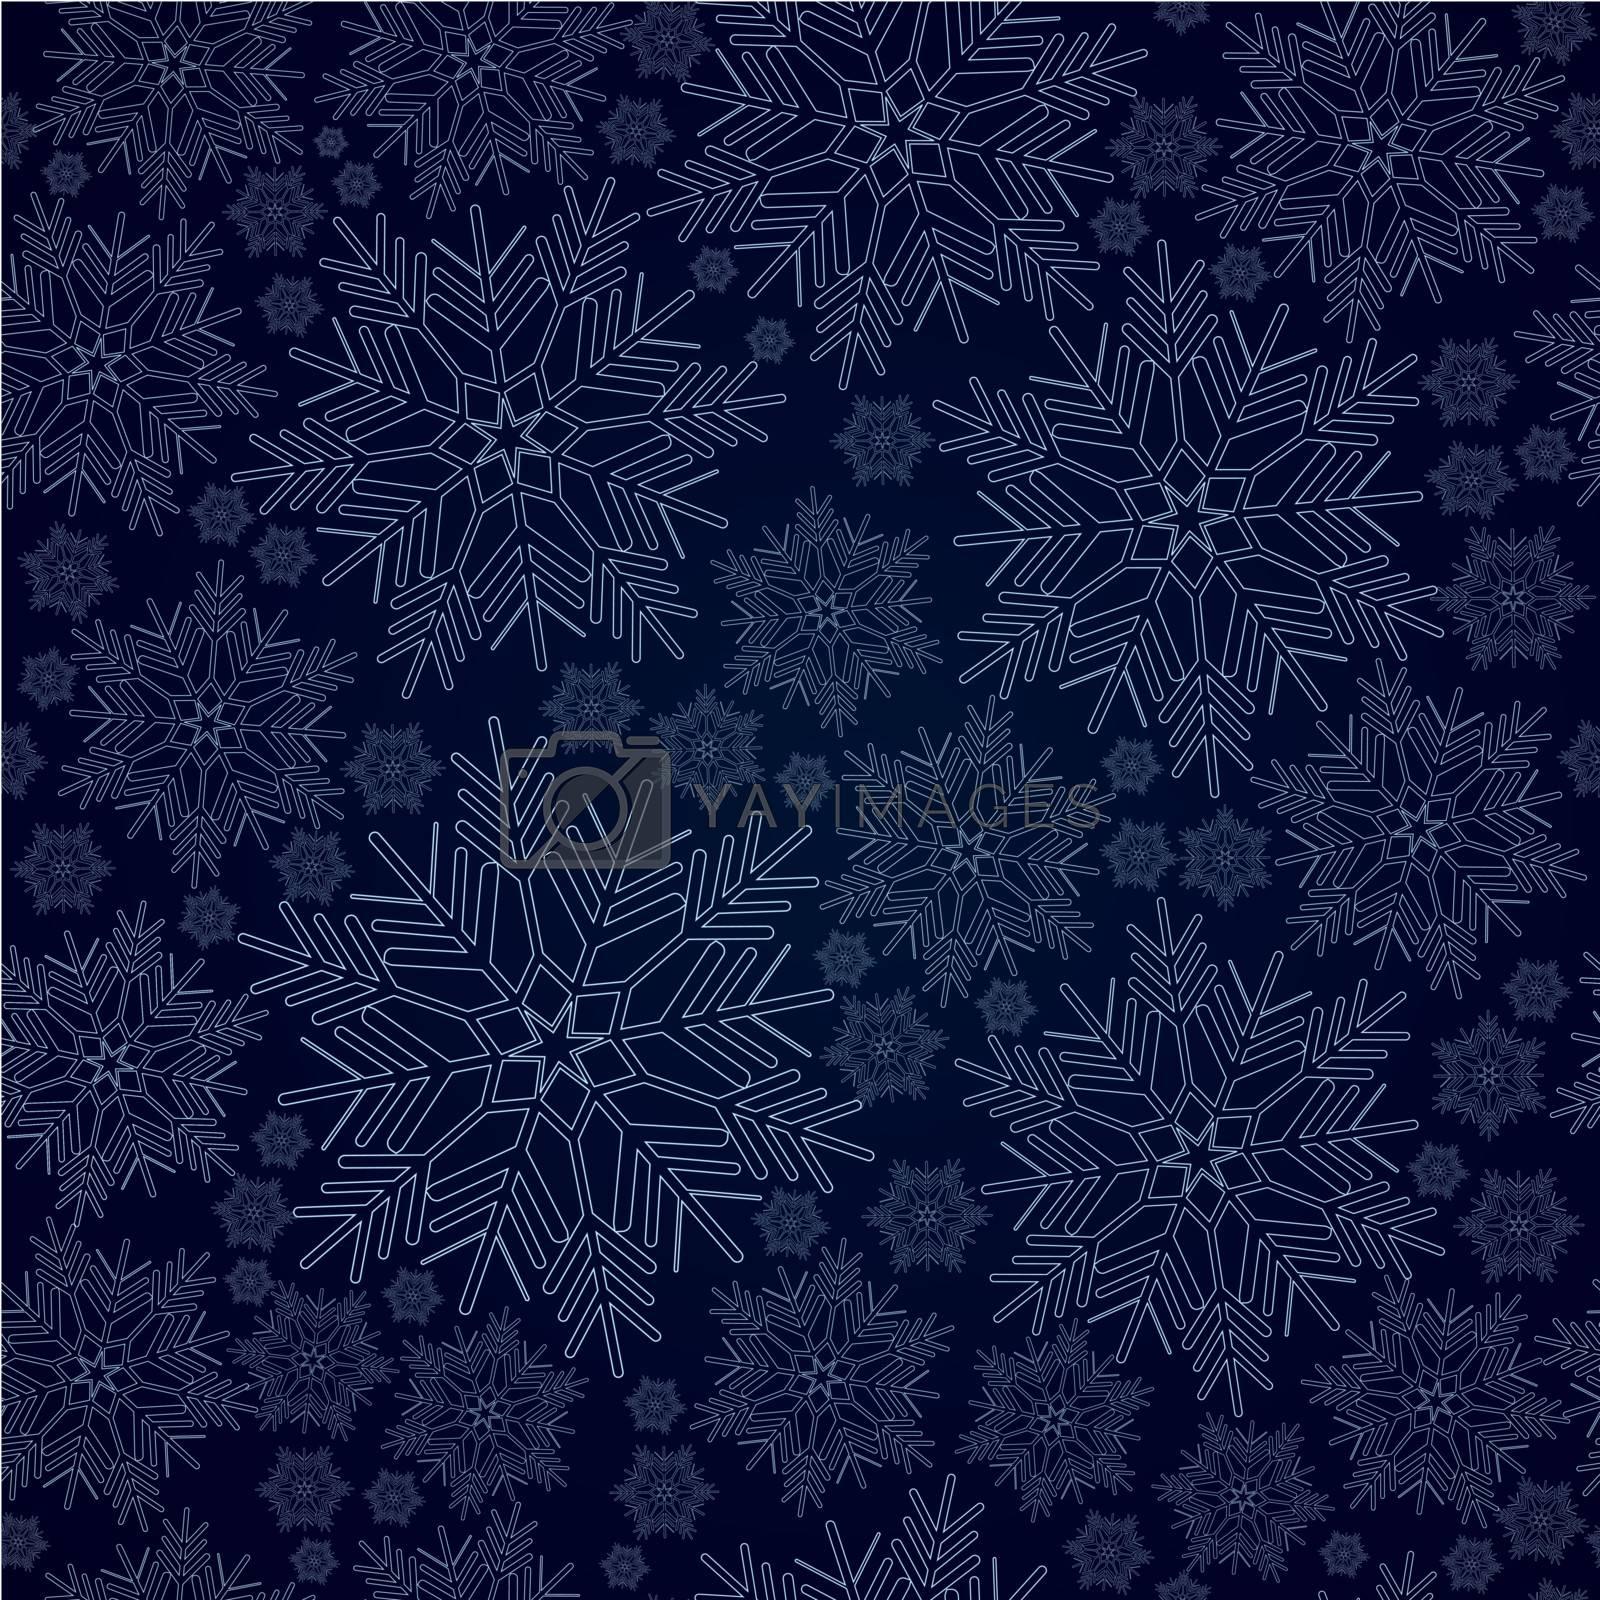 Vector illustration of snowflake seamless pattern on dark blue background